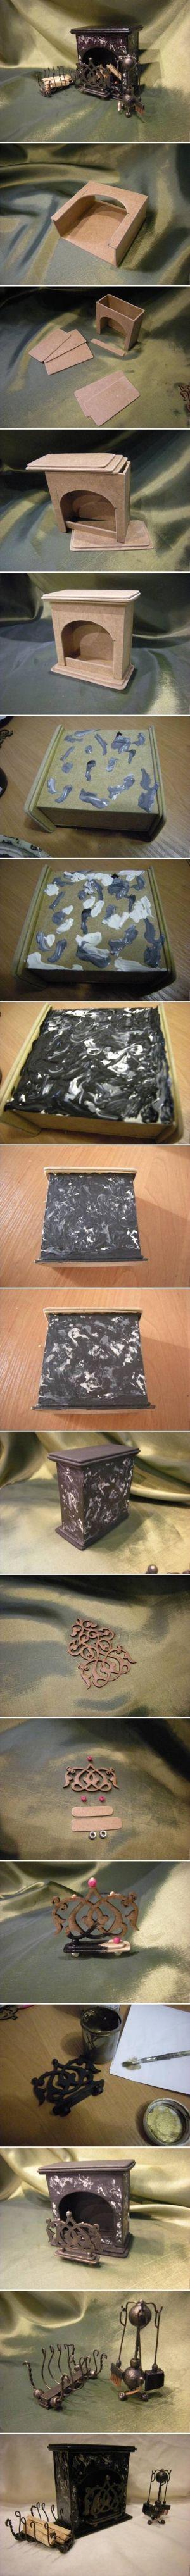 DIY Imitate Stone Fireplace DIY Imitate Stone Fireplace by diyforever